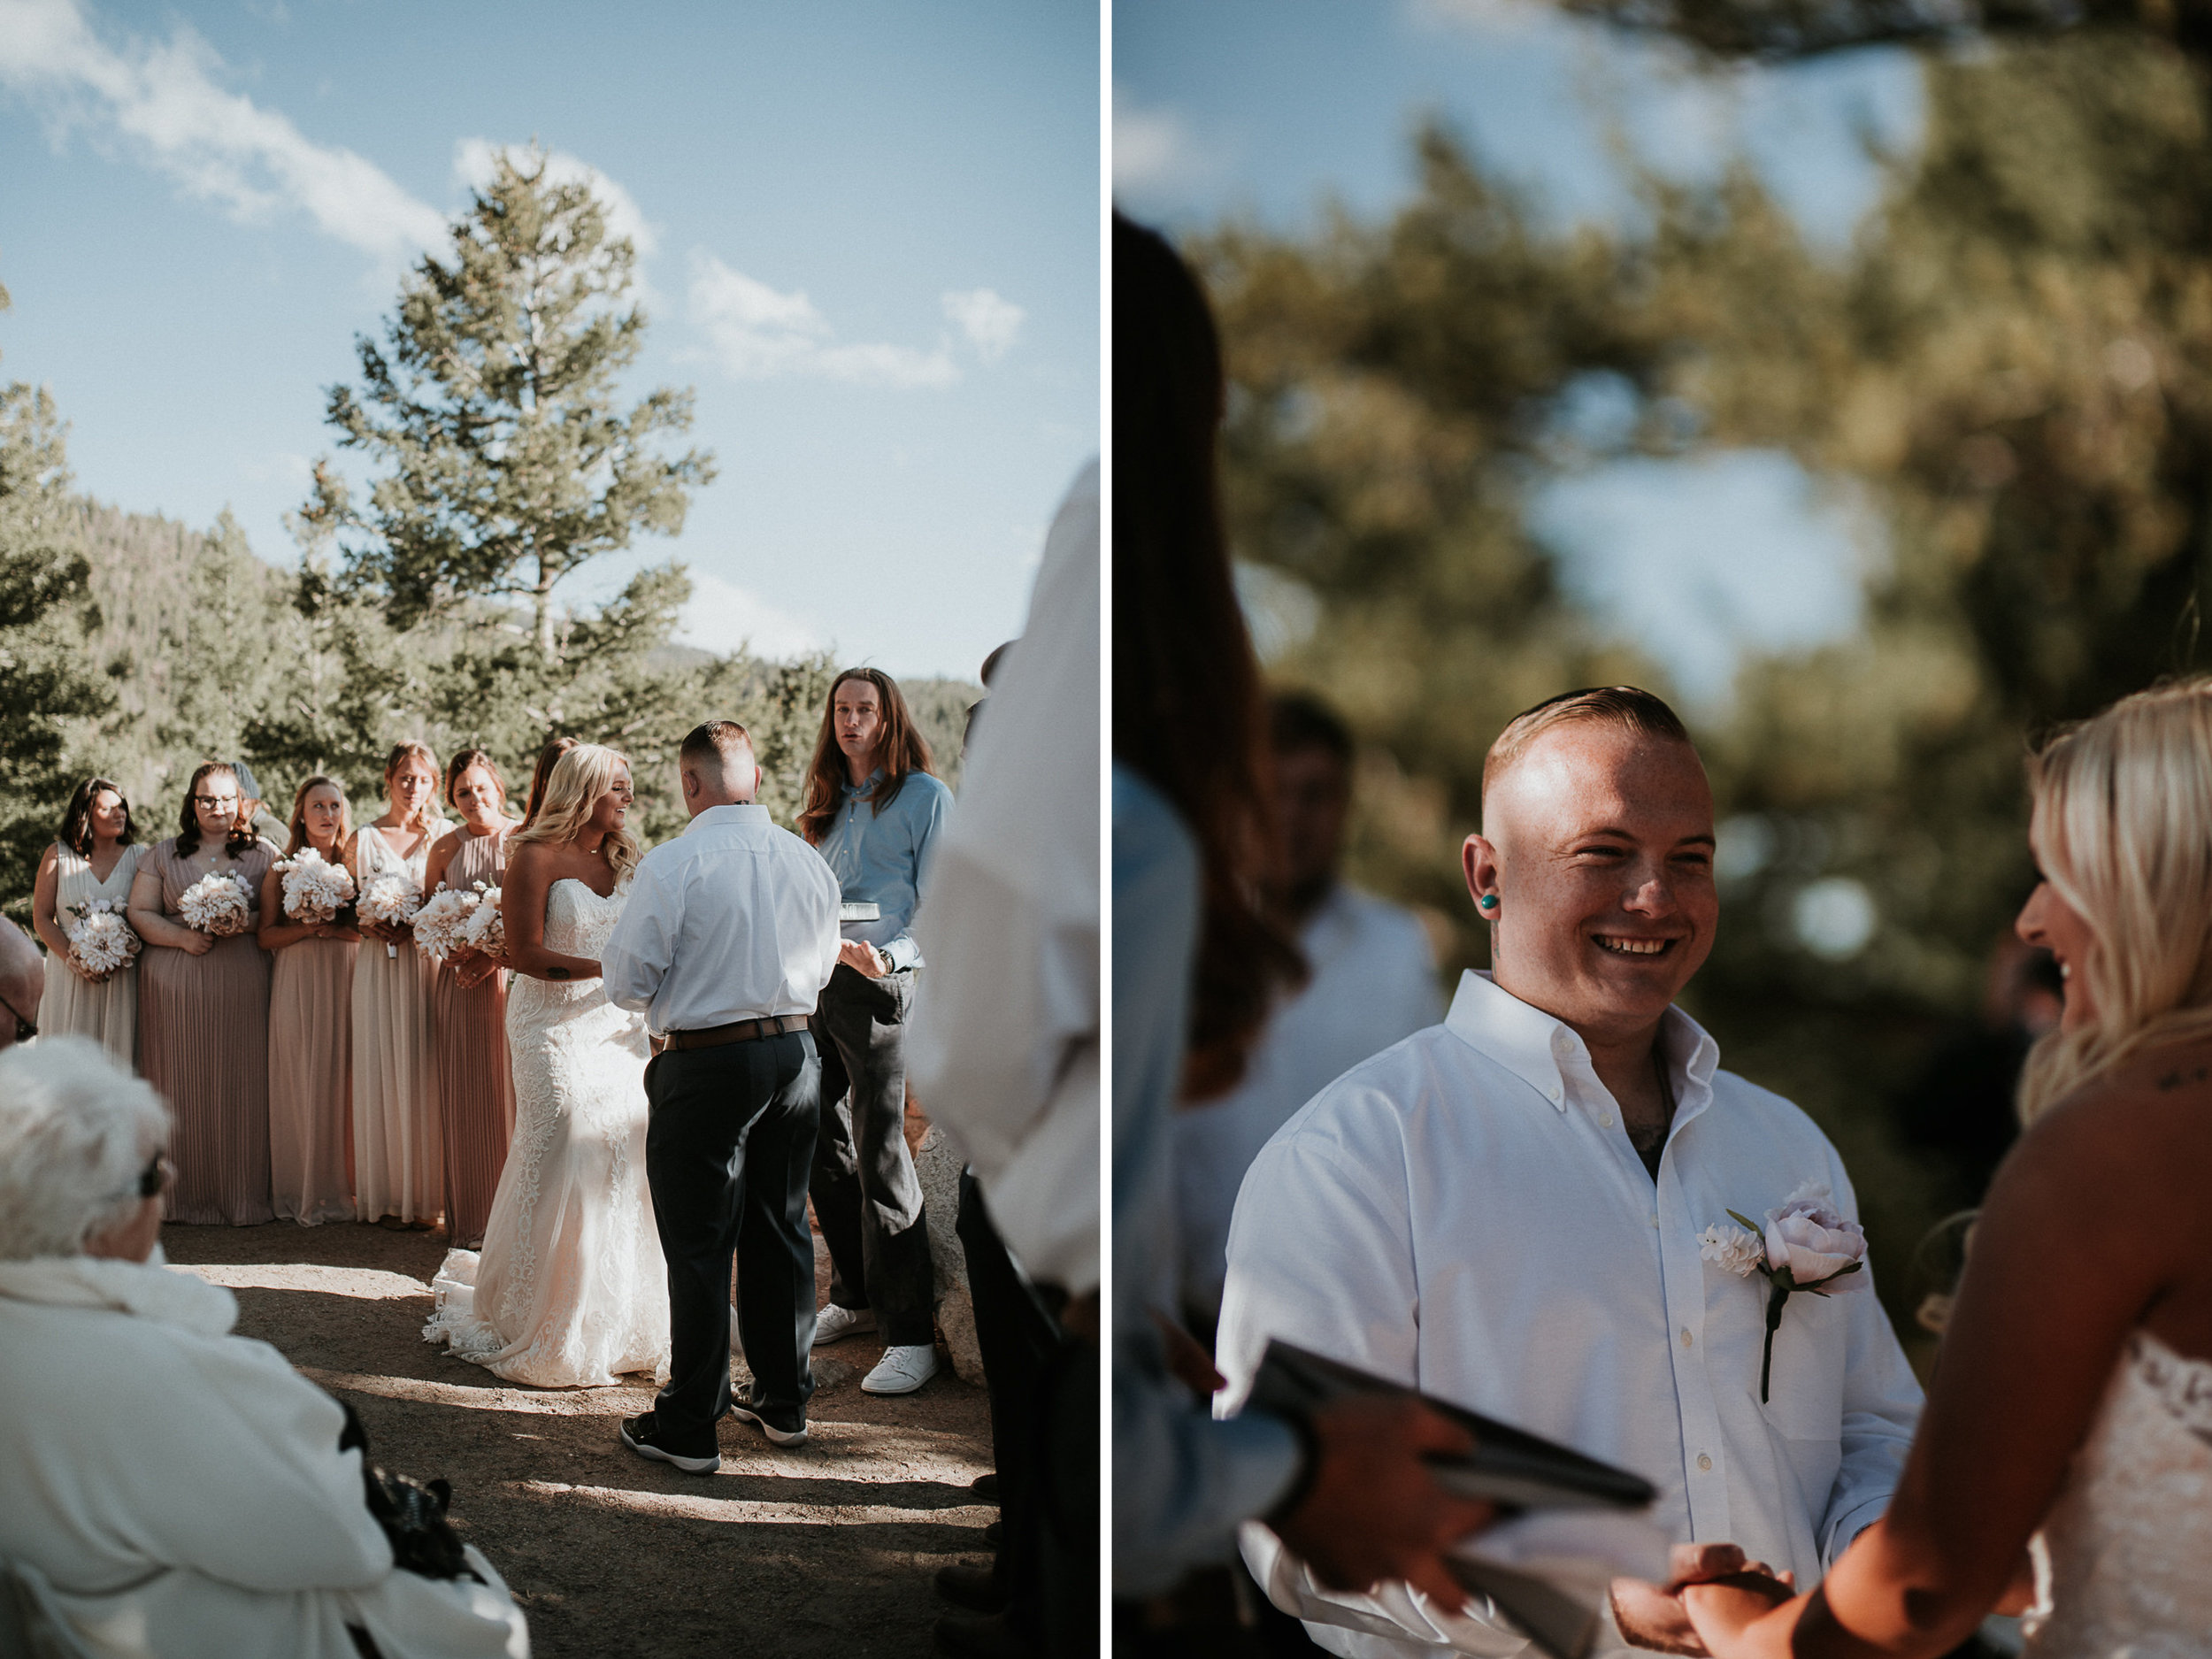 st. louis wedding photographer Zach&Rosalie - Lake Dillon CO Elopement 10.jpg